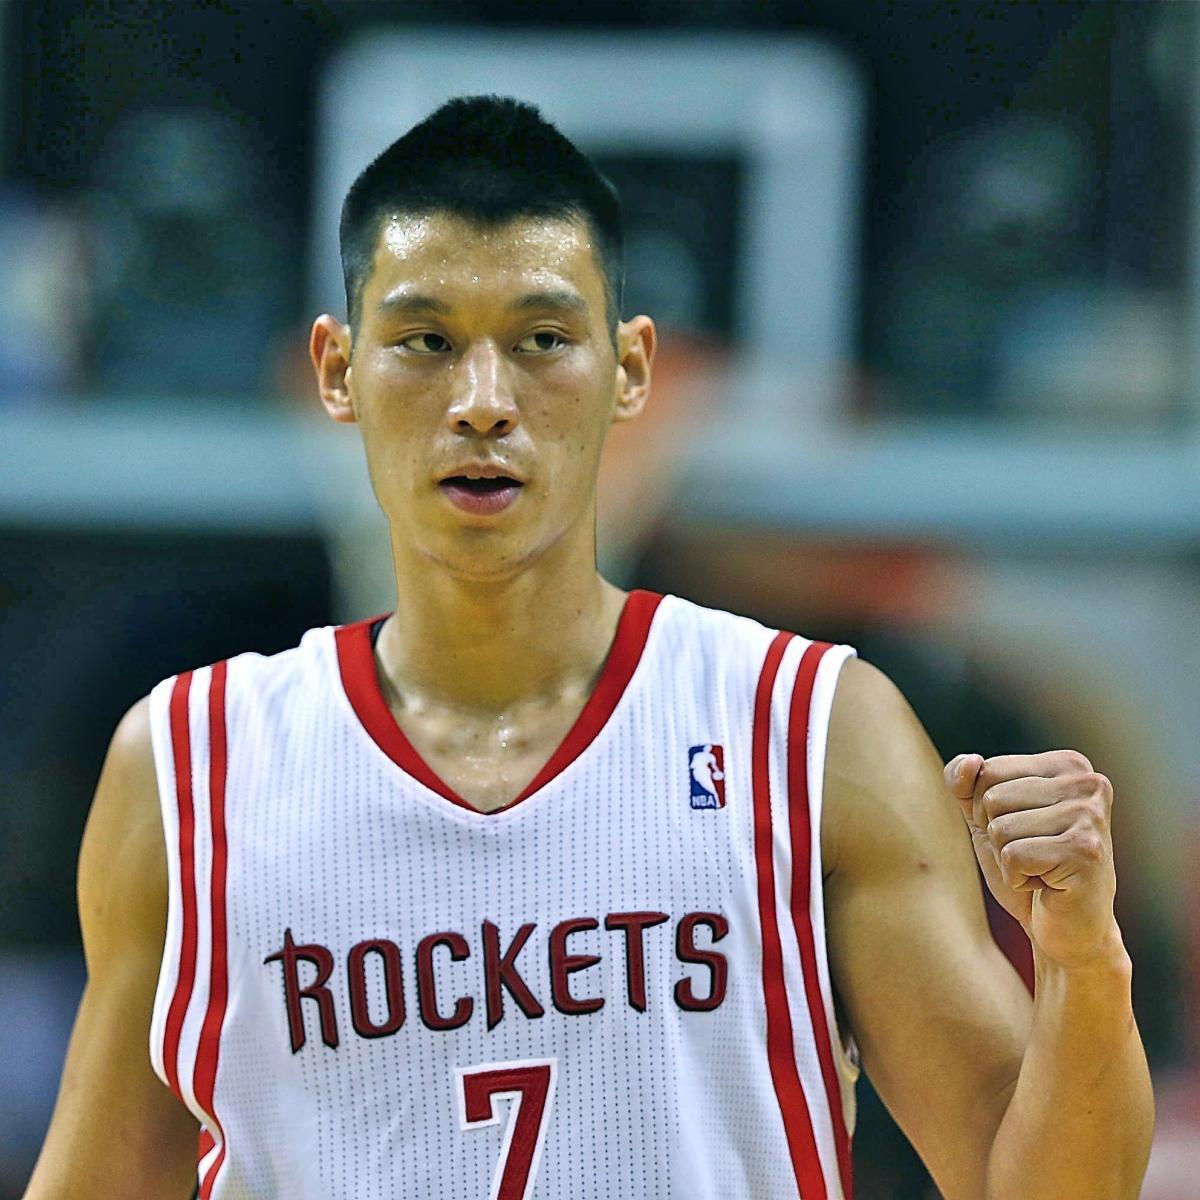 Houston Rockets Vs Denver Nuggets: Denver Nuggets Vs. Houston Rockets: Live Score, Results